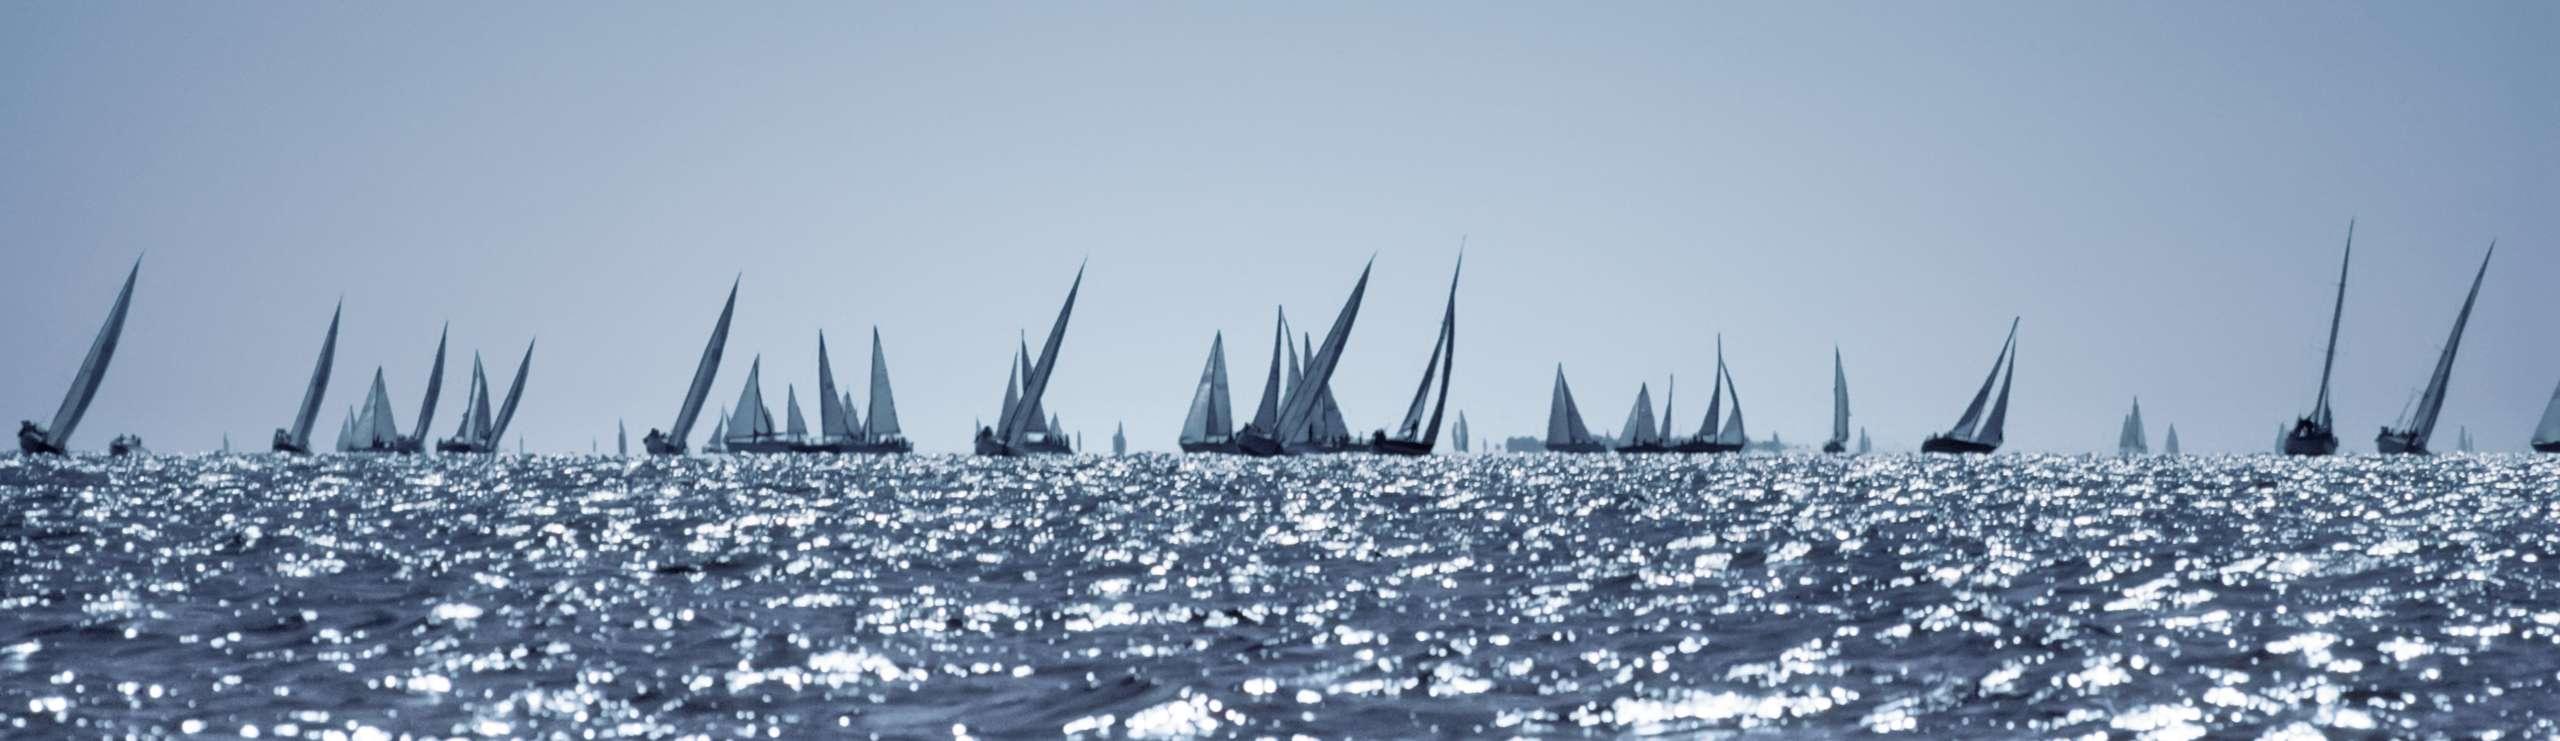 PORTFOLIO - Sailing - Chesapeake #15   PCG139